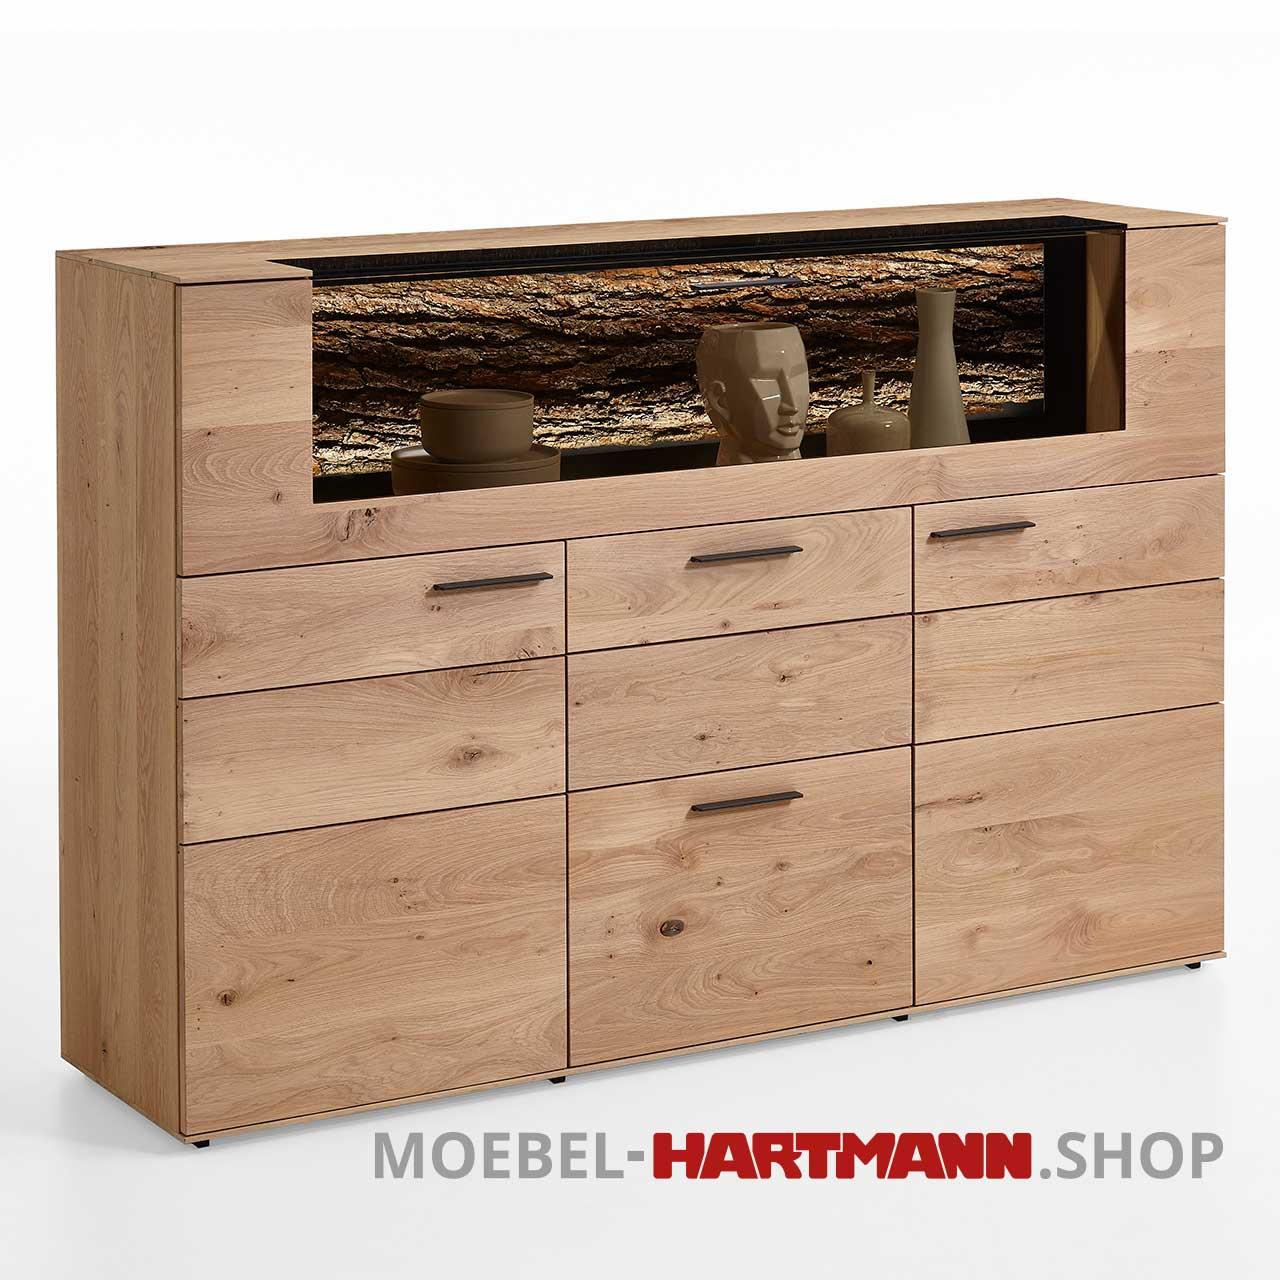 hartmann runa highboard 8410 6171 moebel. Black Bedroom Furniture Sets. Home Design Ideas